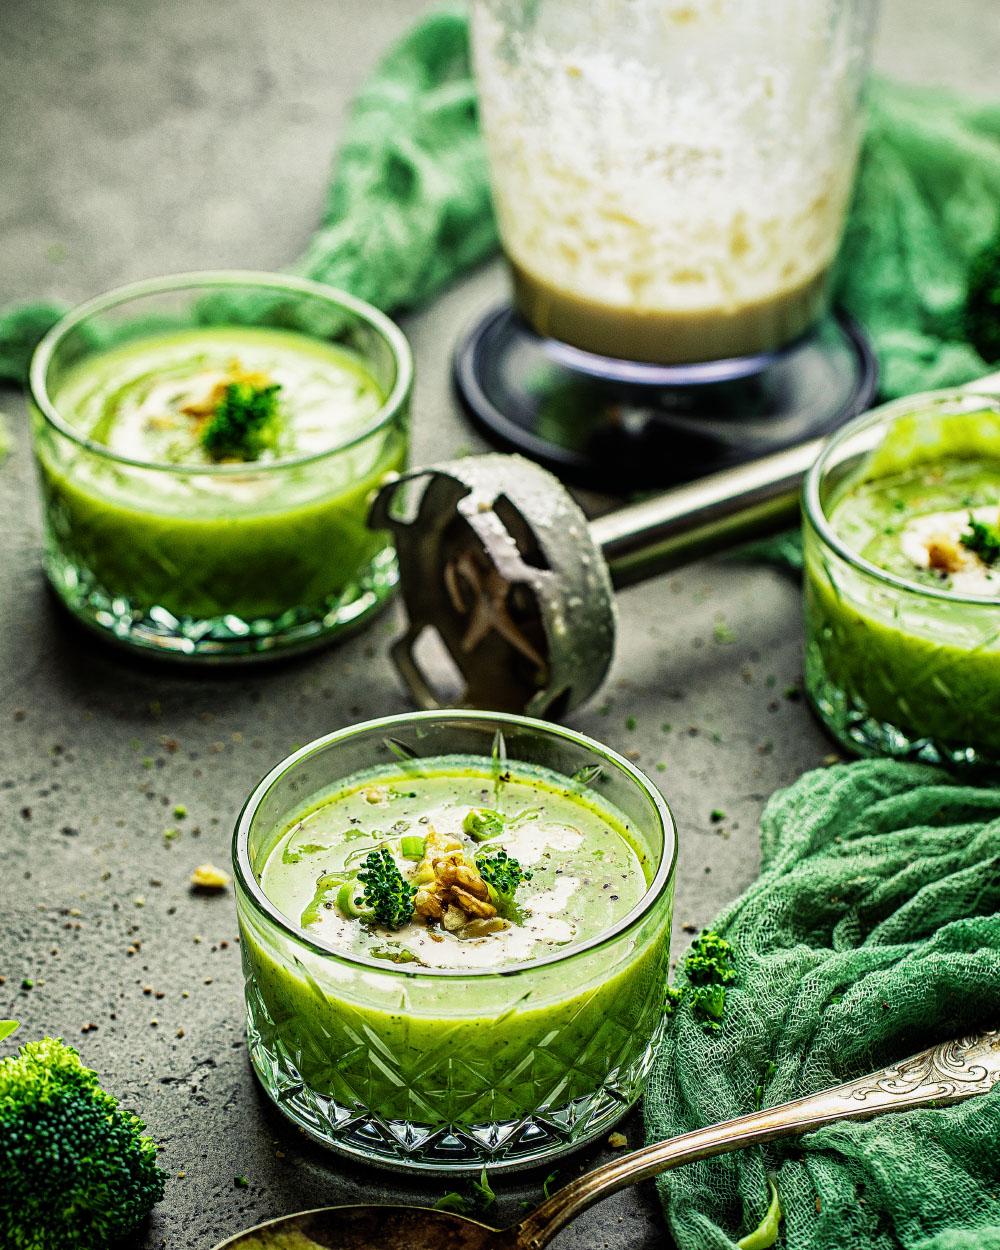 Brokkoli-Suppe vegan - einfaches Rezept fitfood und kalorienarm